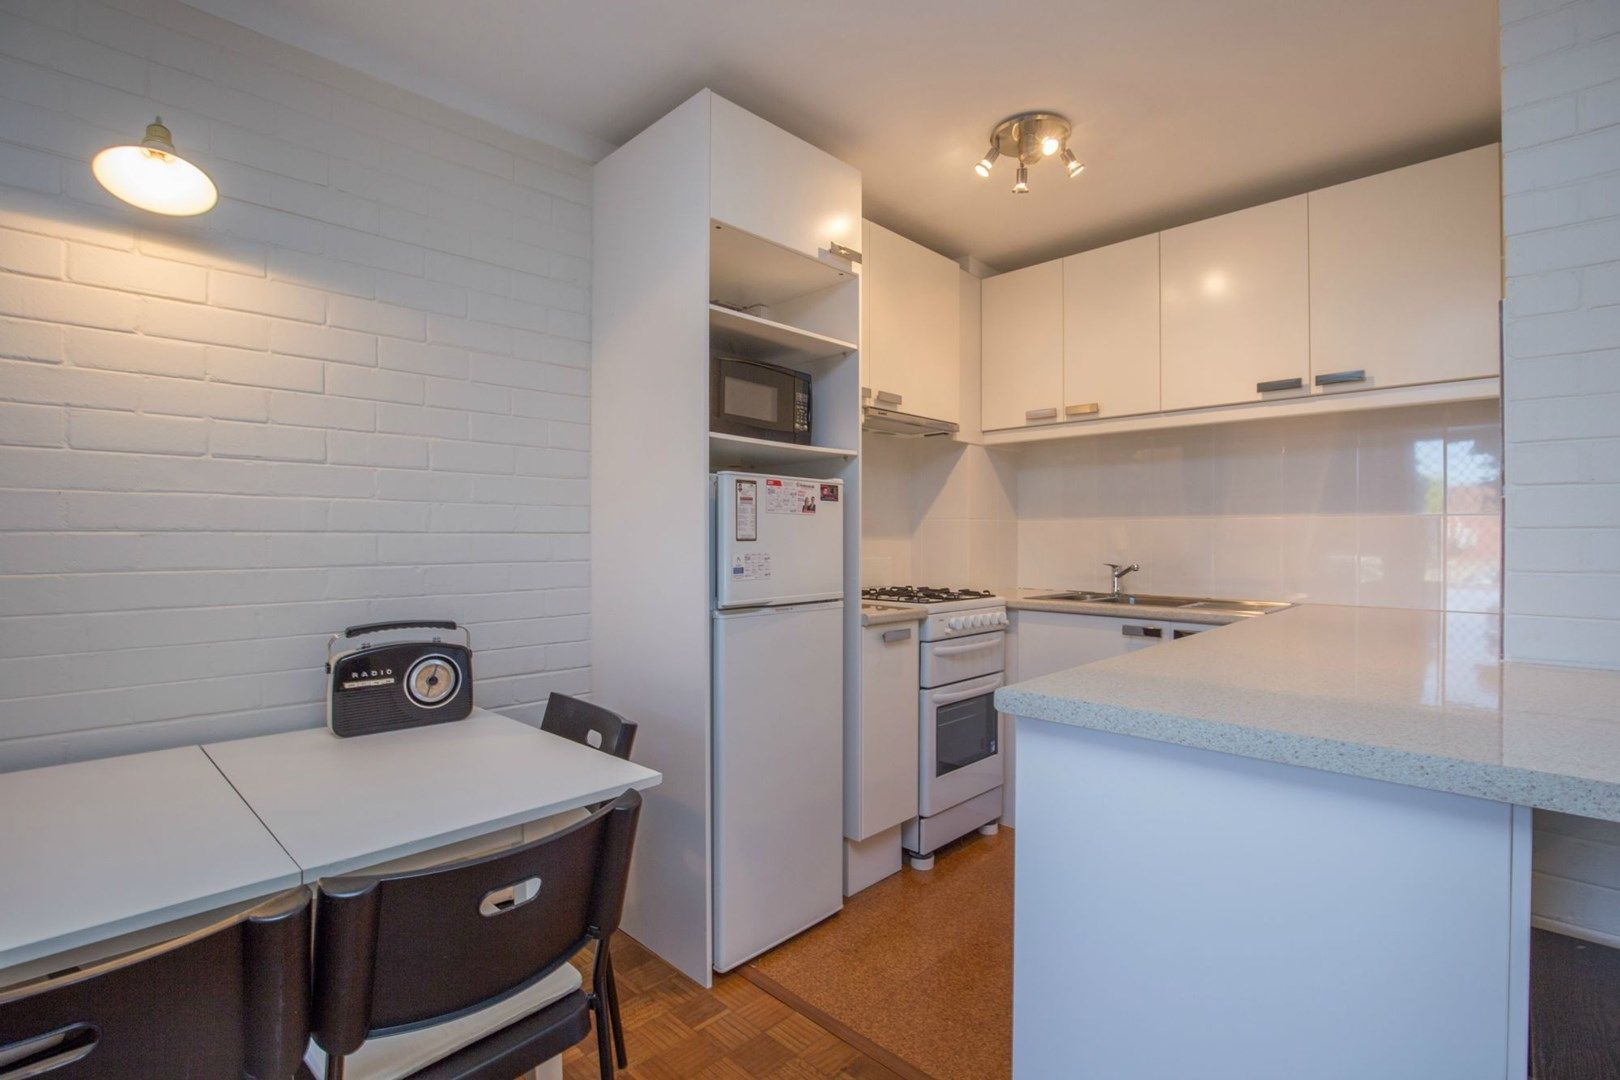 2/564 William Street, Mount Lawley WA 6050, Image 0